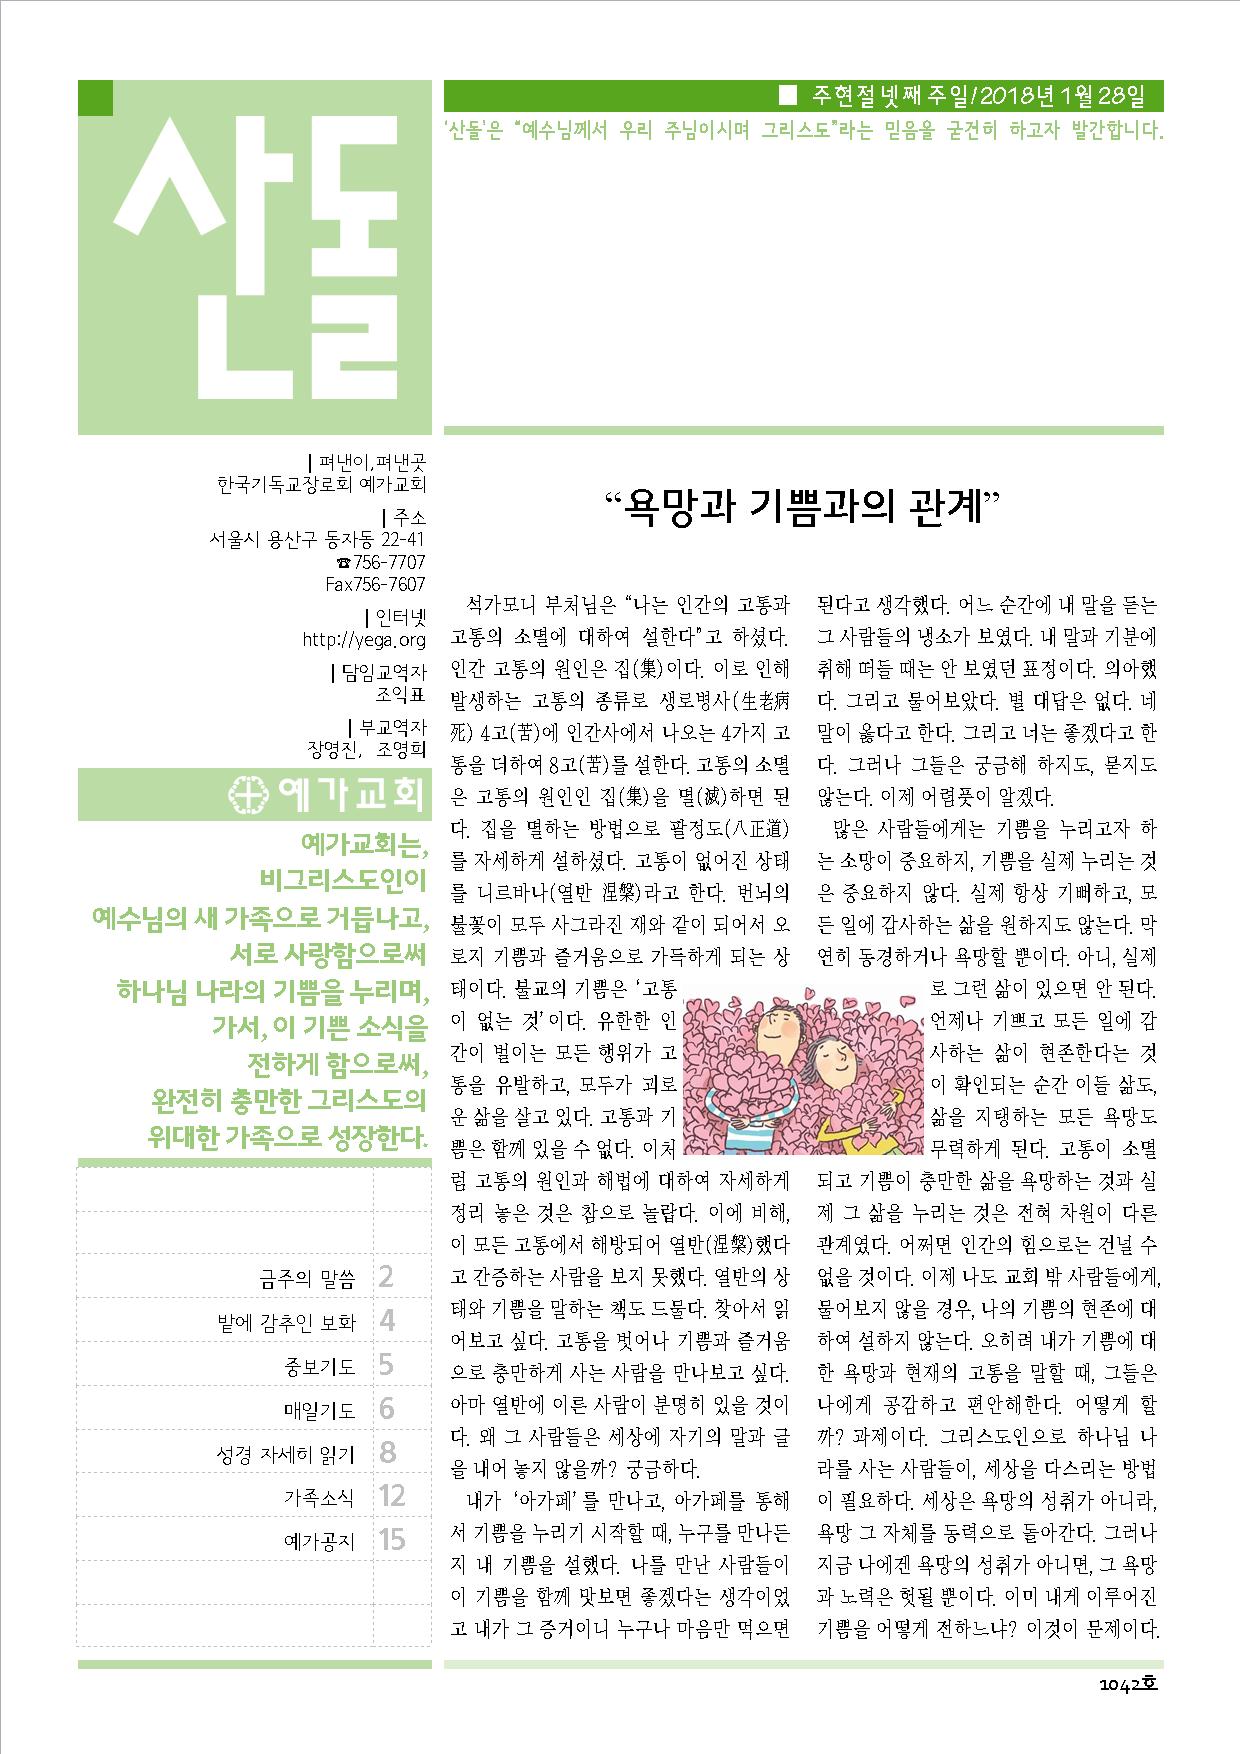 18sdjb0128_페이지_01.png